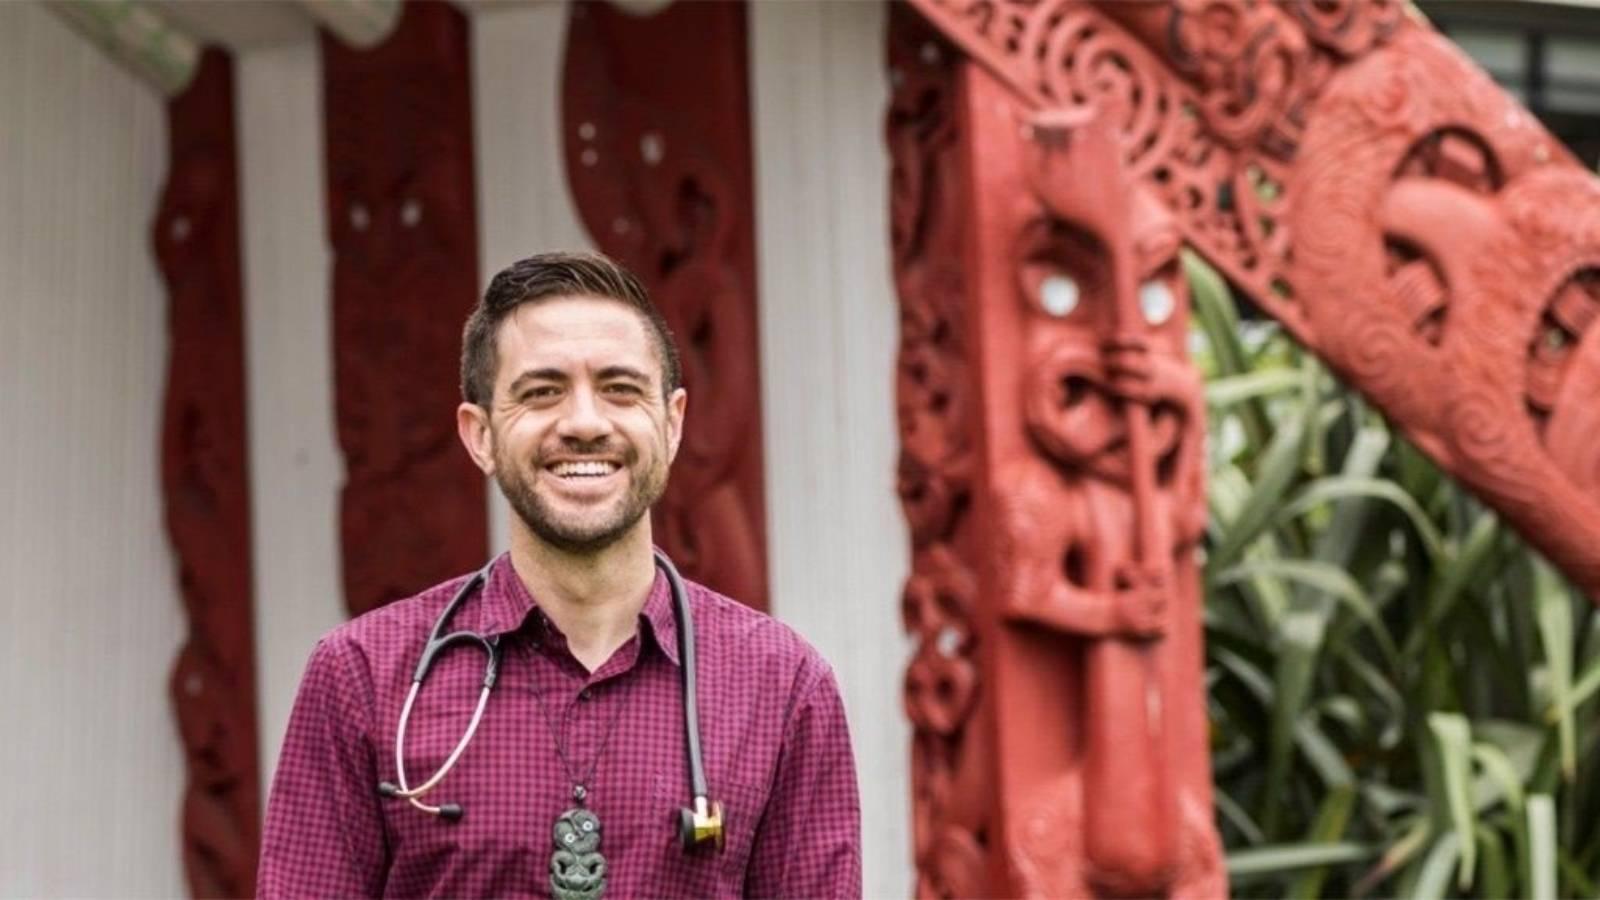 Karawhiua: New campaign urges Covid-19 vaccine to protect whānau